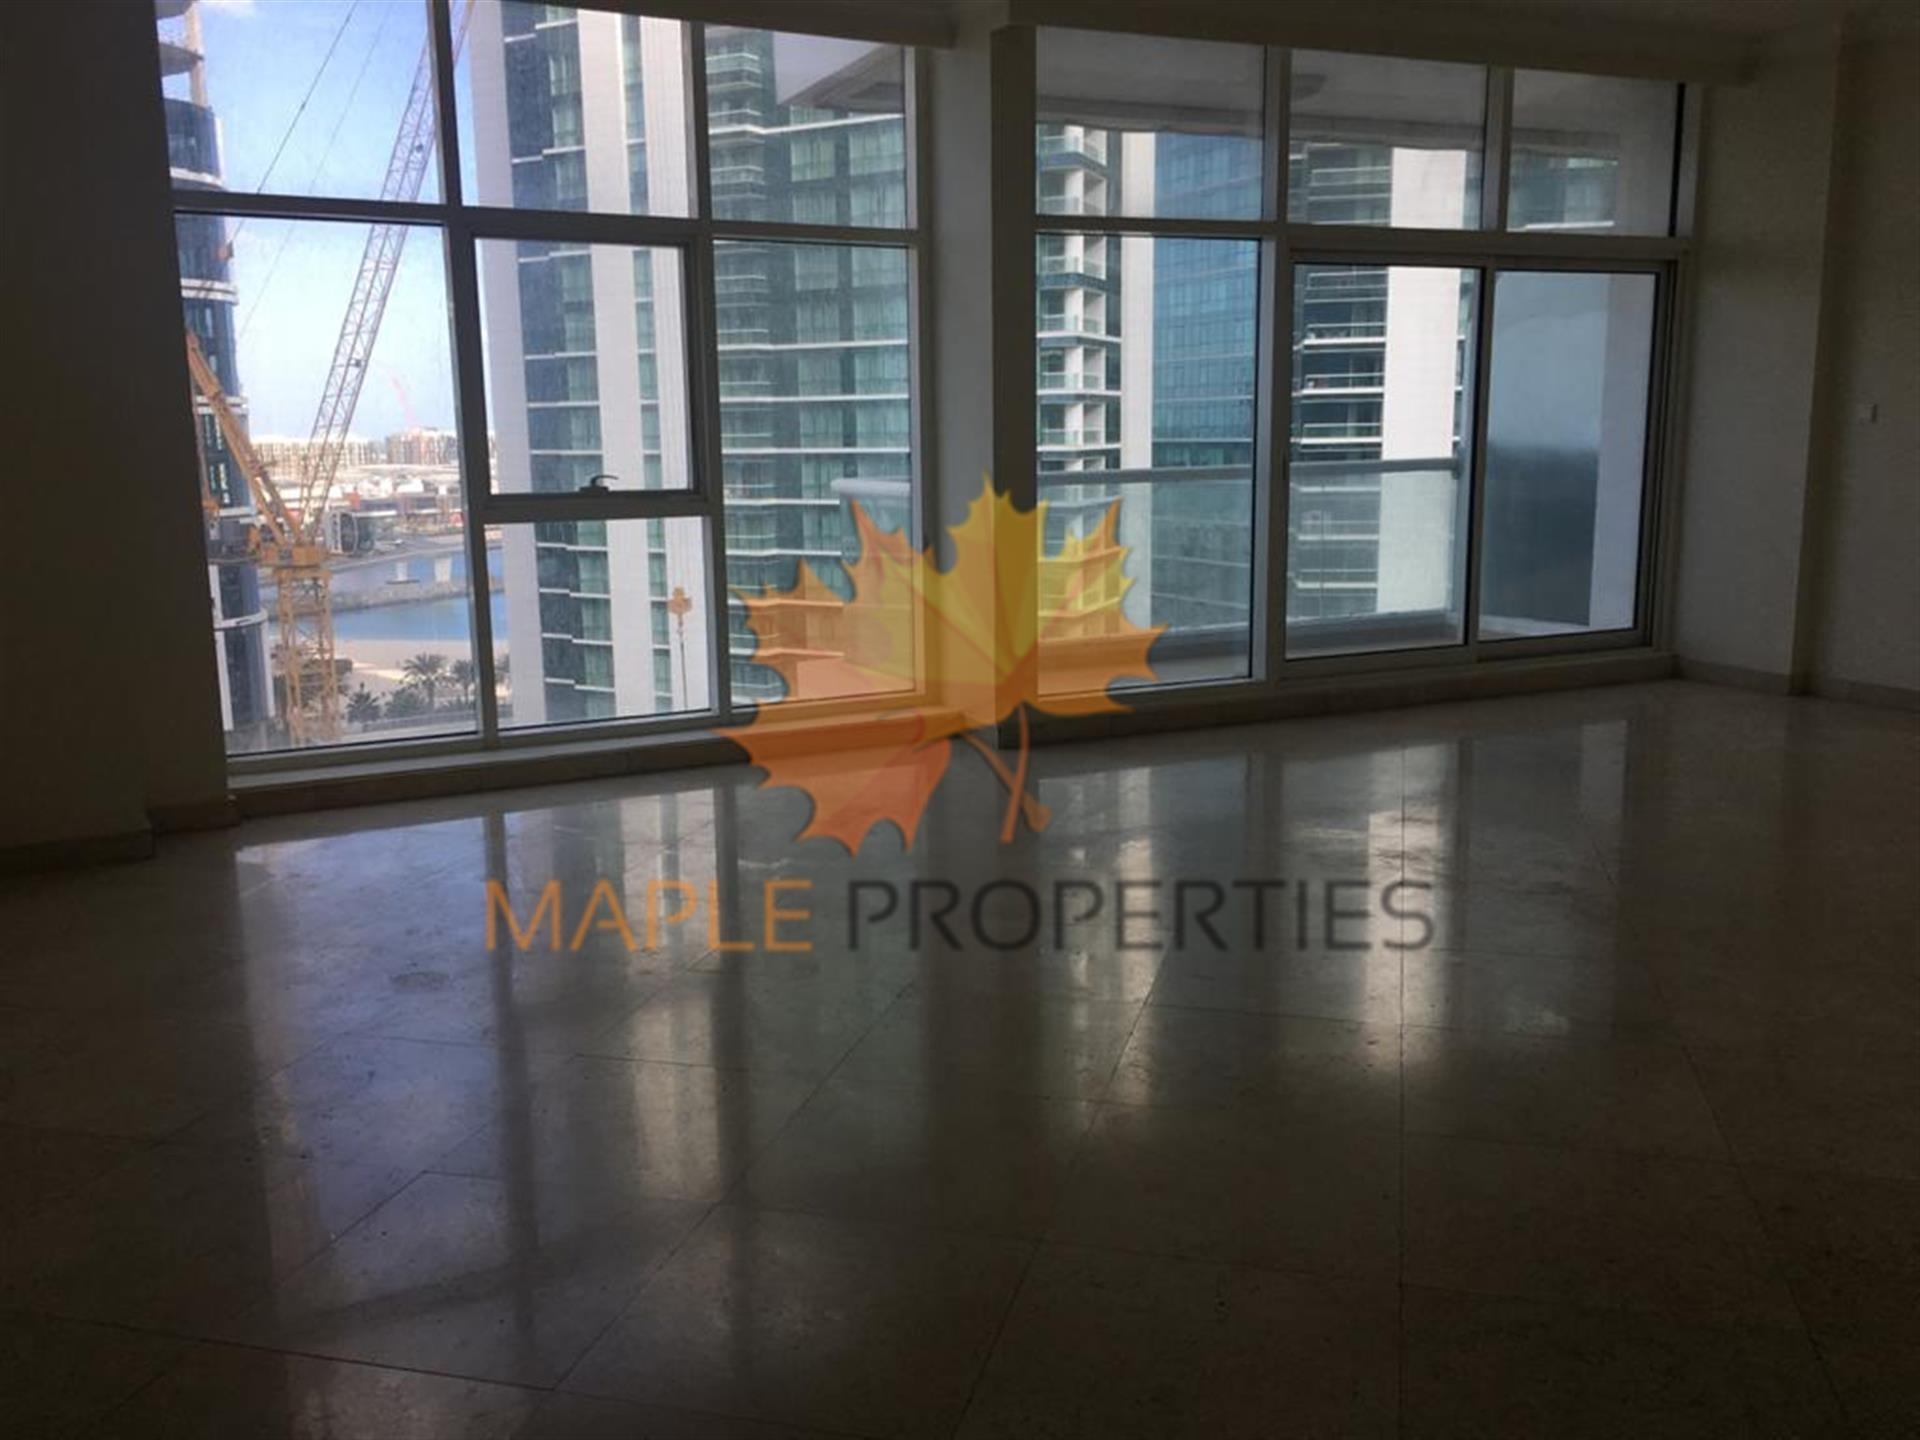 Spacious 3BR For Rent |Sea View| Dorra Bay Marina